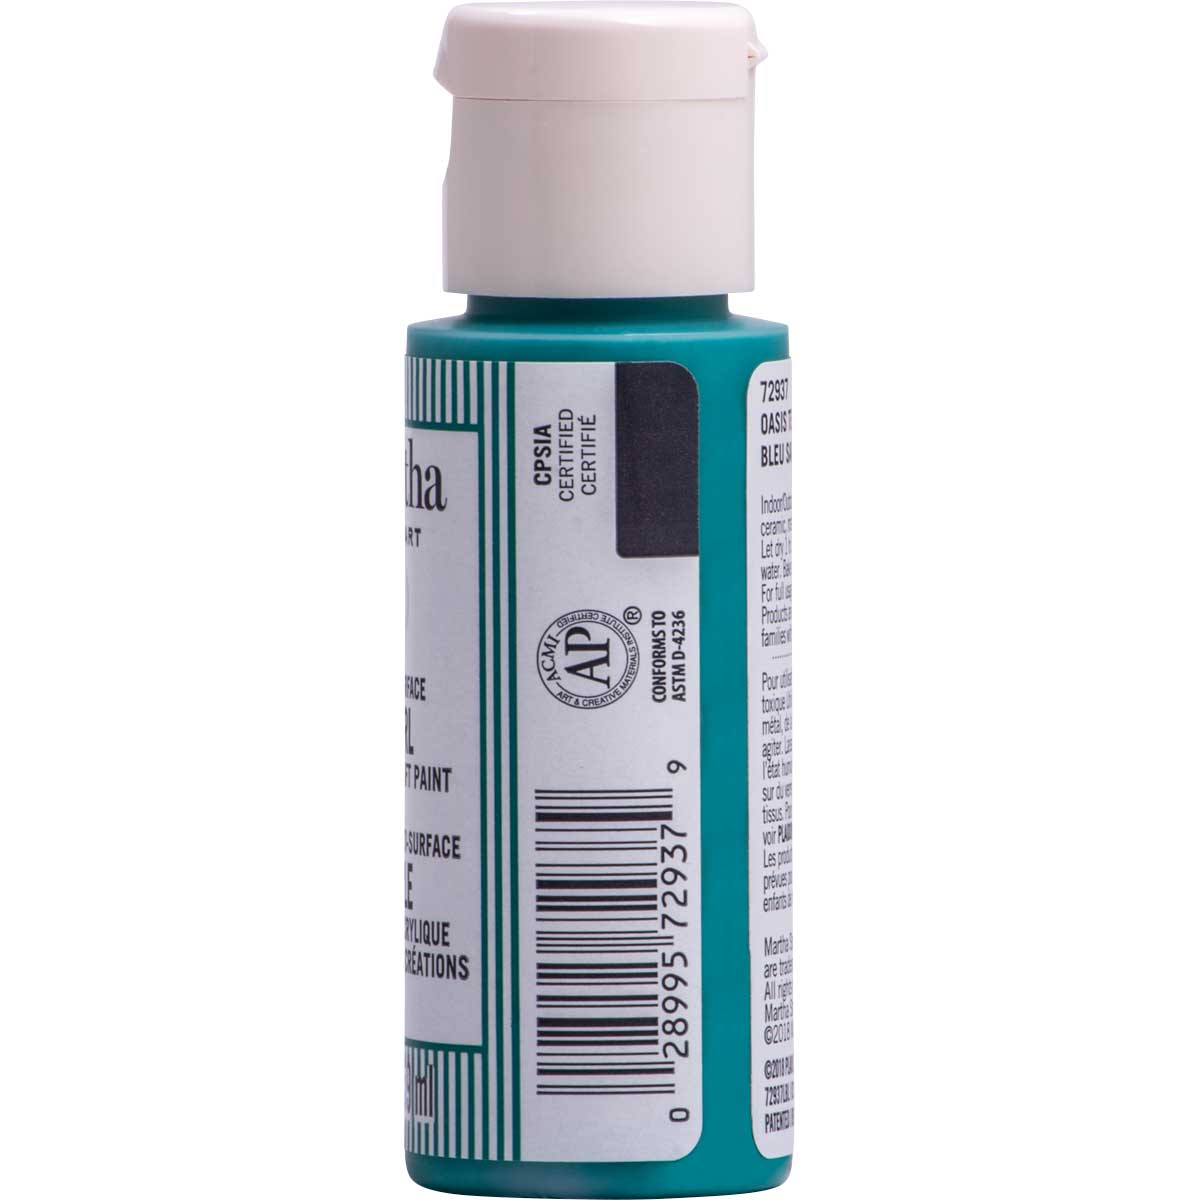 Martha Stewart ® Multi-Surface Pearl Acrylic Craft Paint CPSIA - Oasis Teal, 2 oz. - 72937